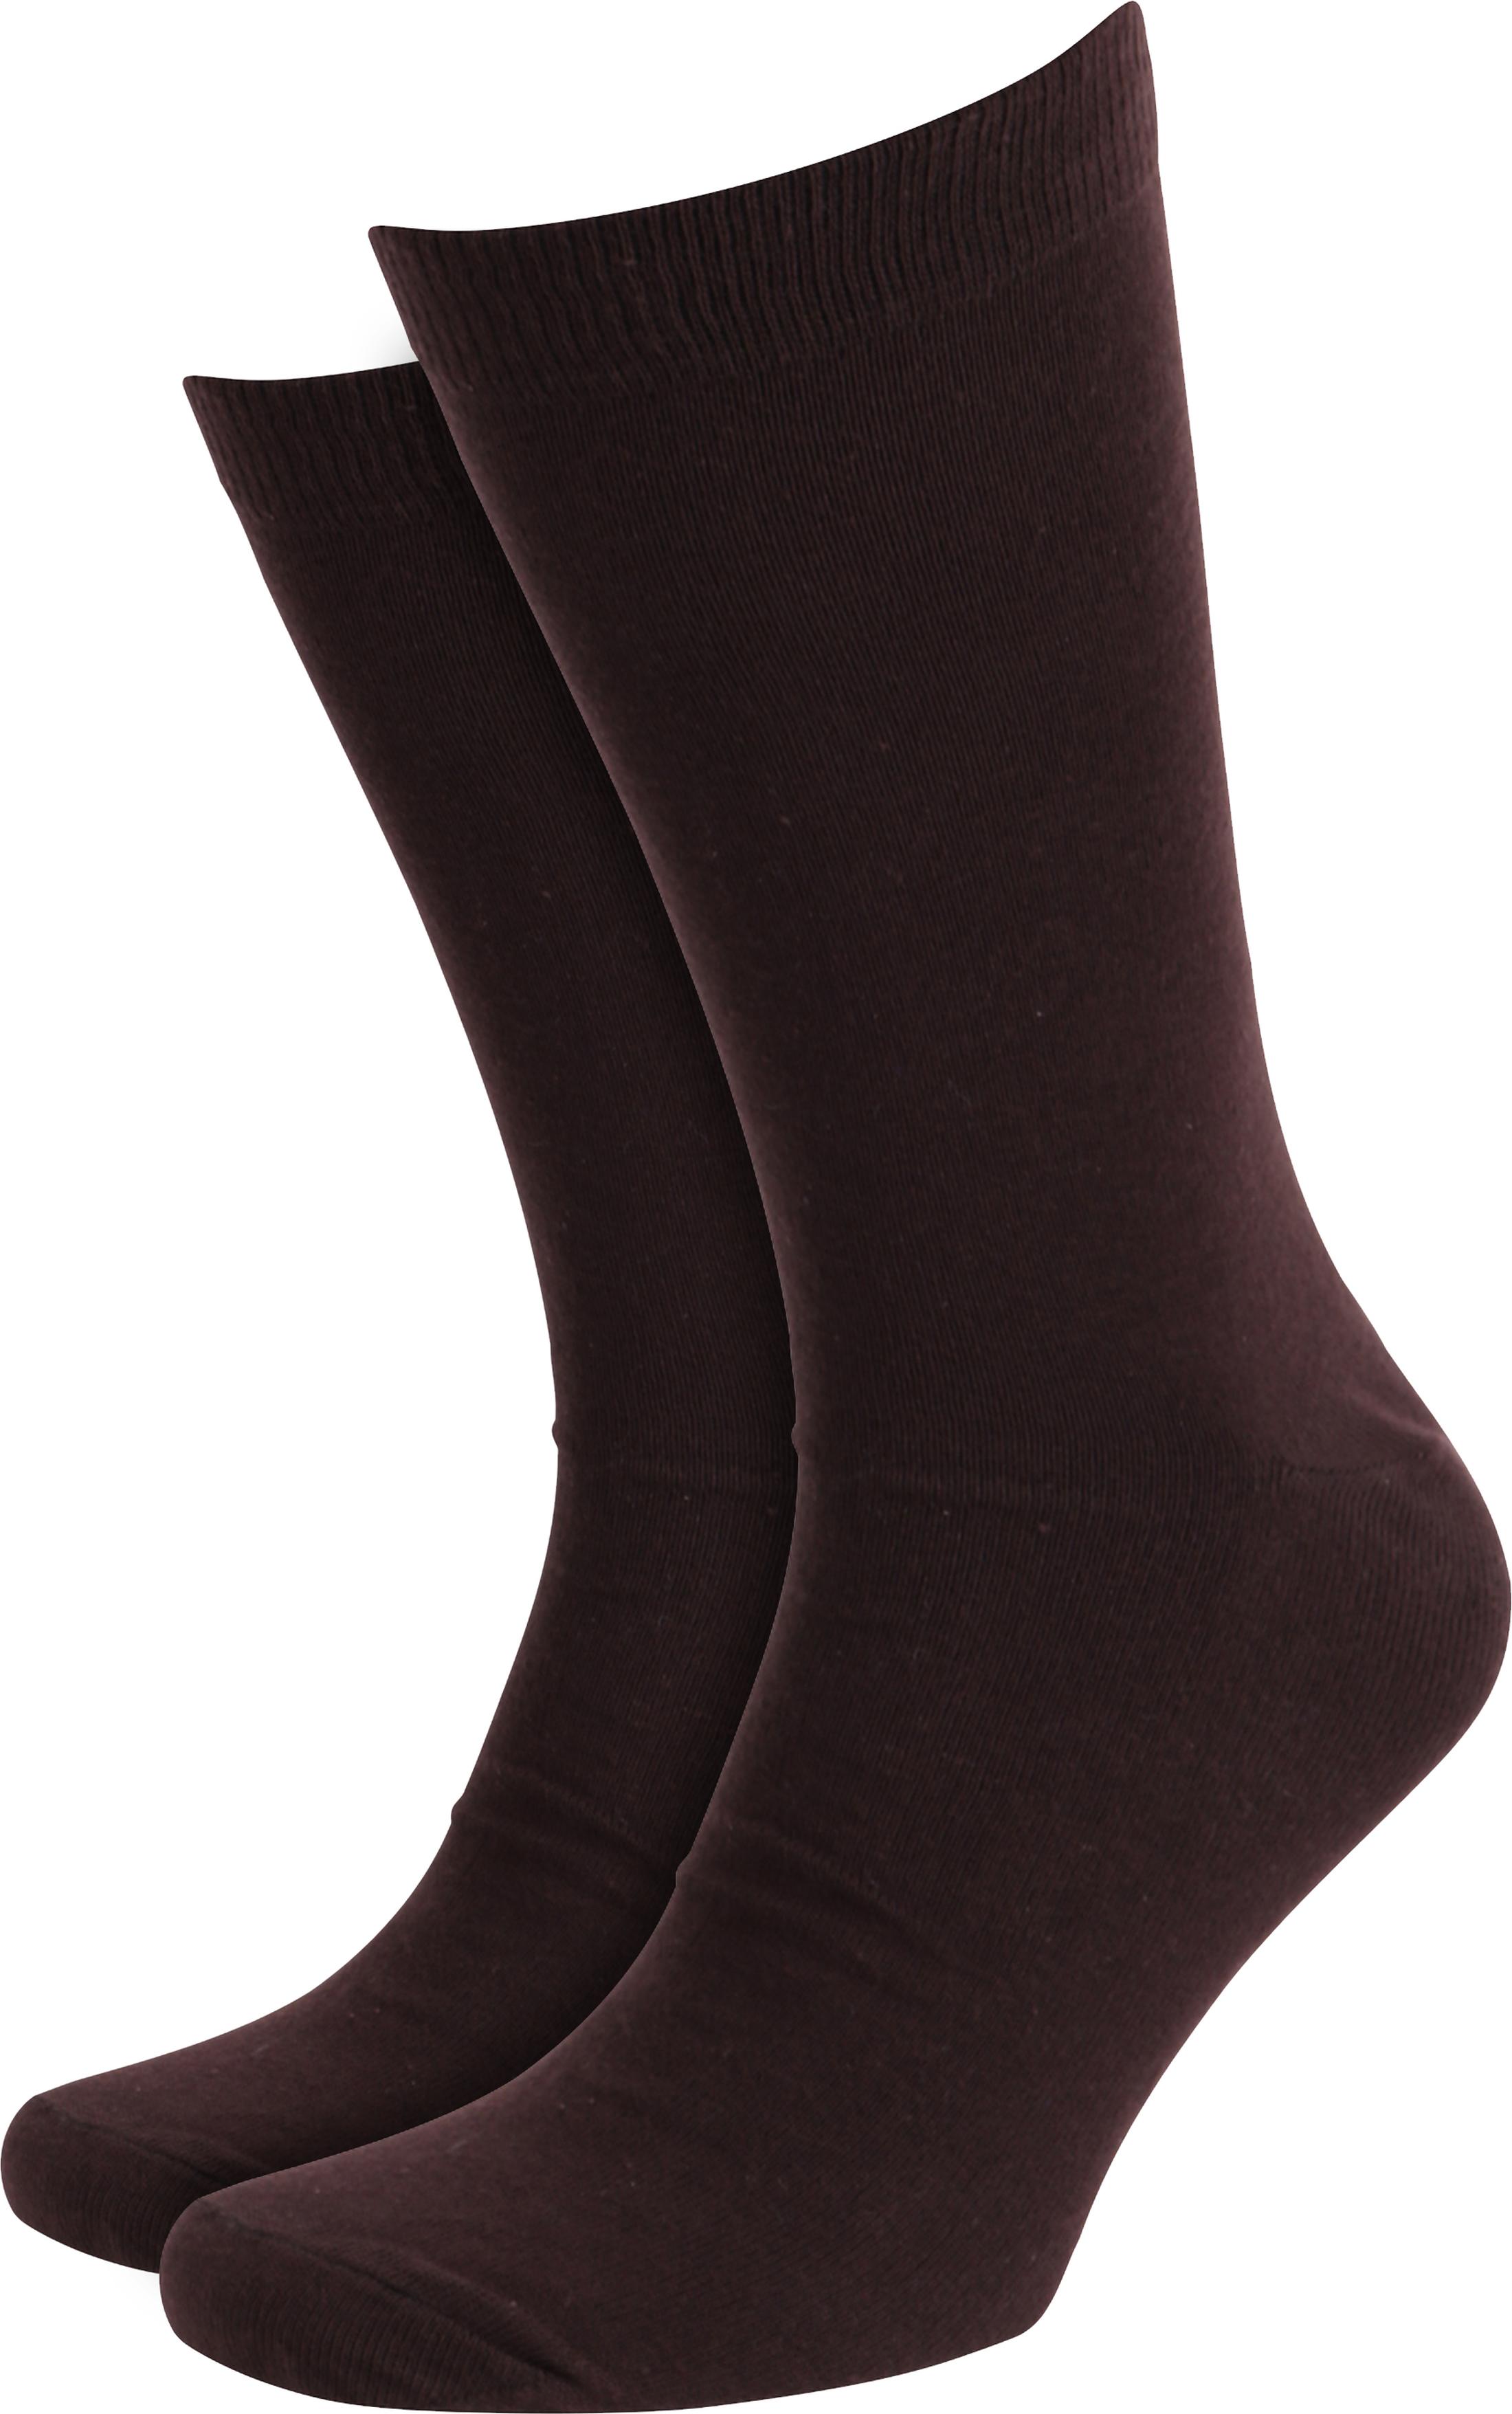 Suitable Socken Braun foto 0